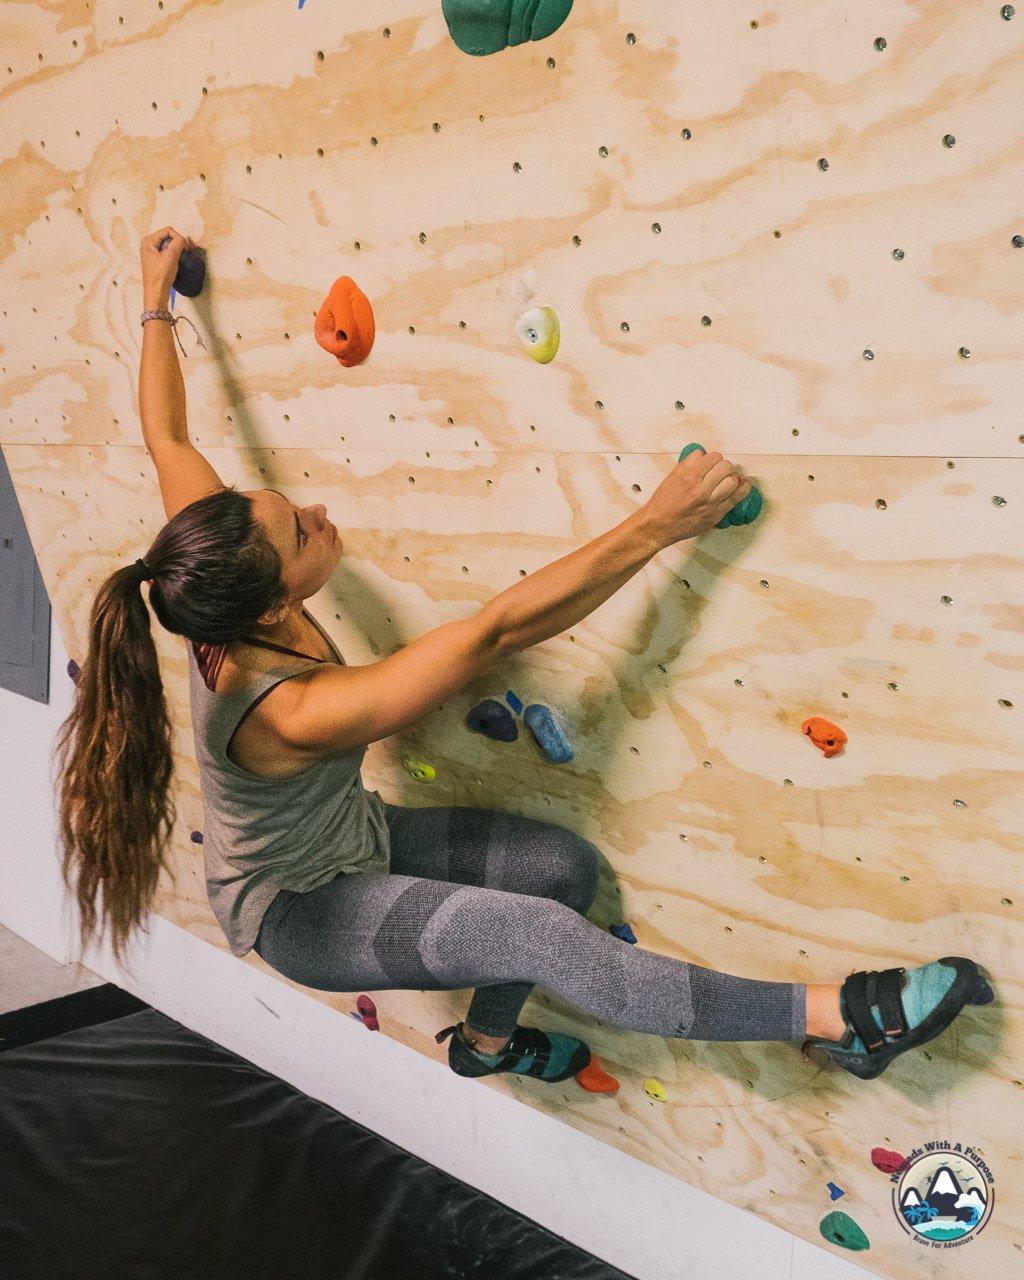 Luna Hylete Tights, Best for Yoga